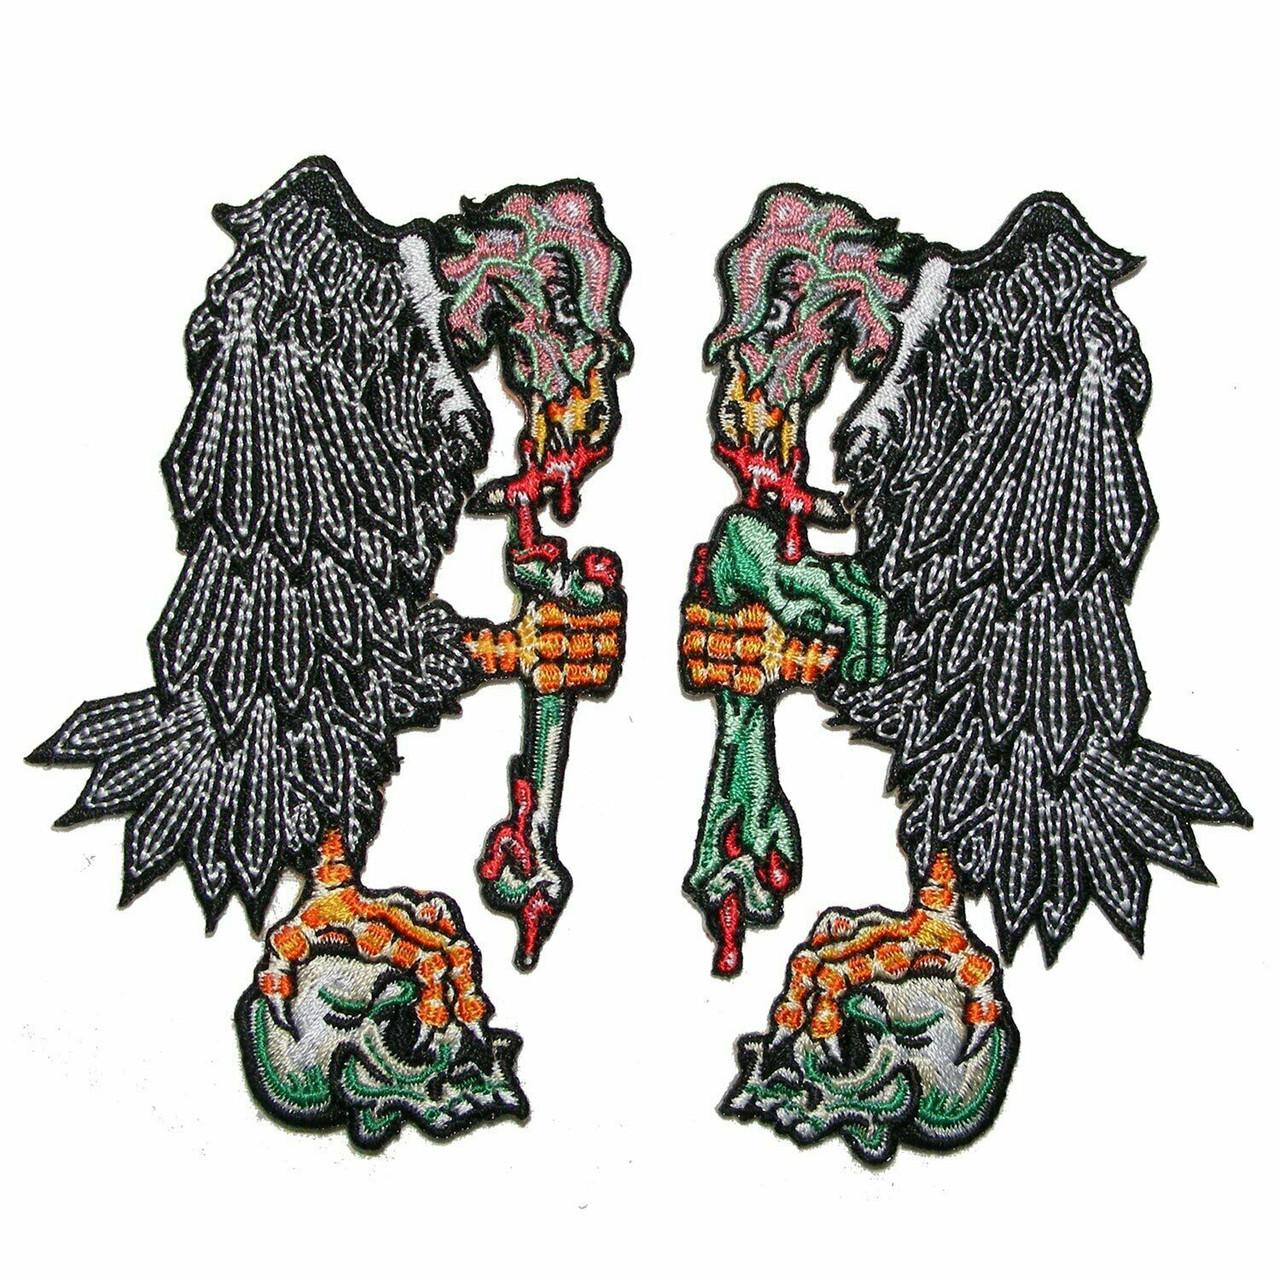 Kreepsville 666 Voodoo Goat Skull Embroidered Patch Horror Halloween NEW Goth